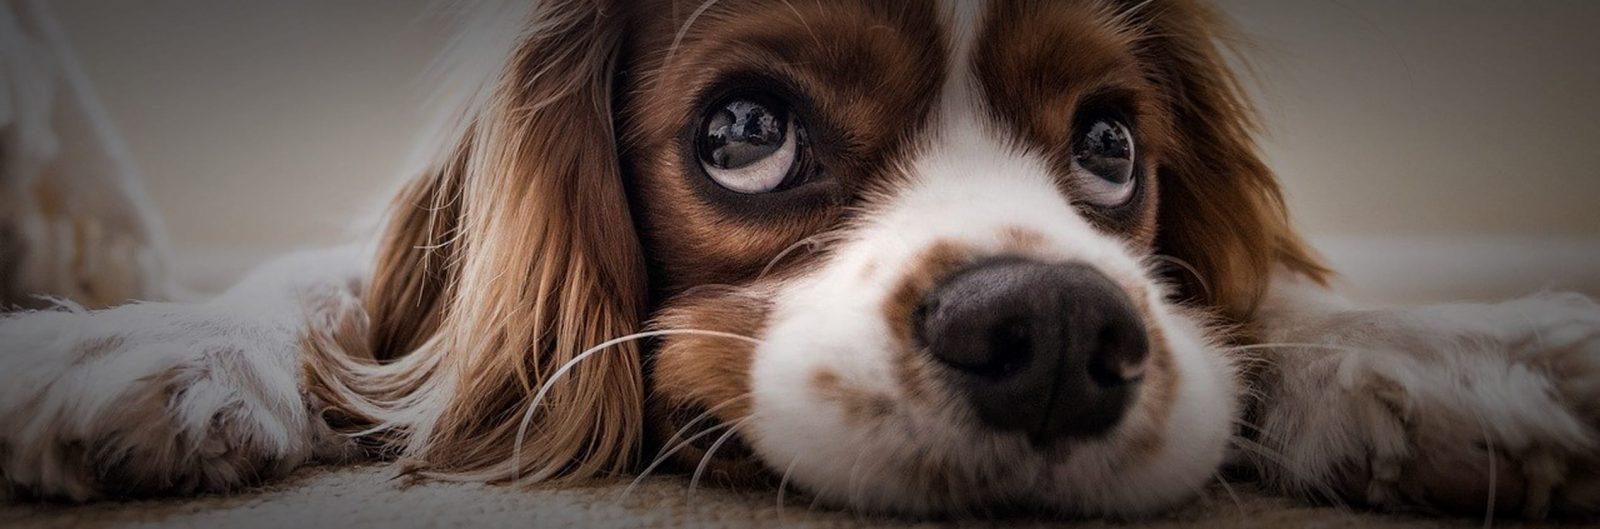 Blindengeleidehond wordt emotioneel